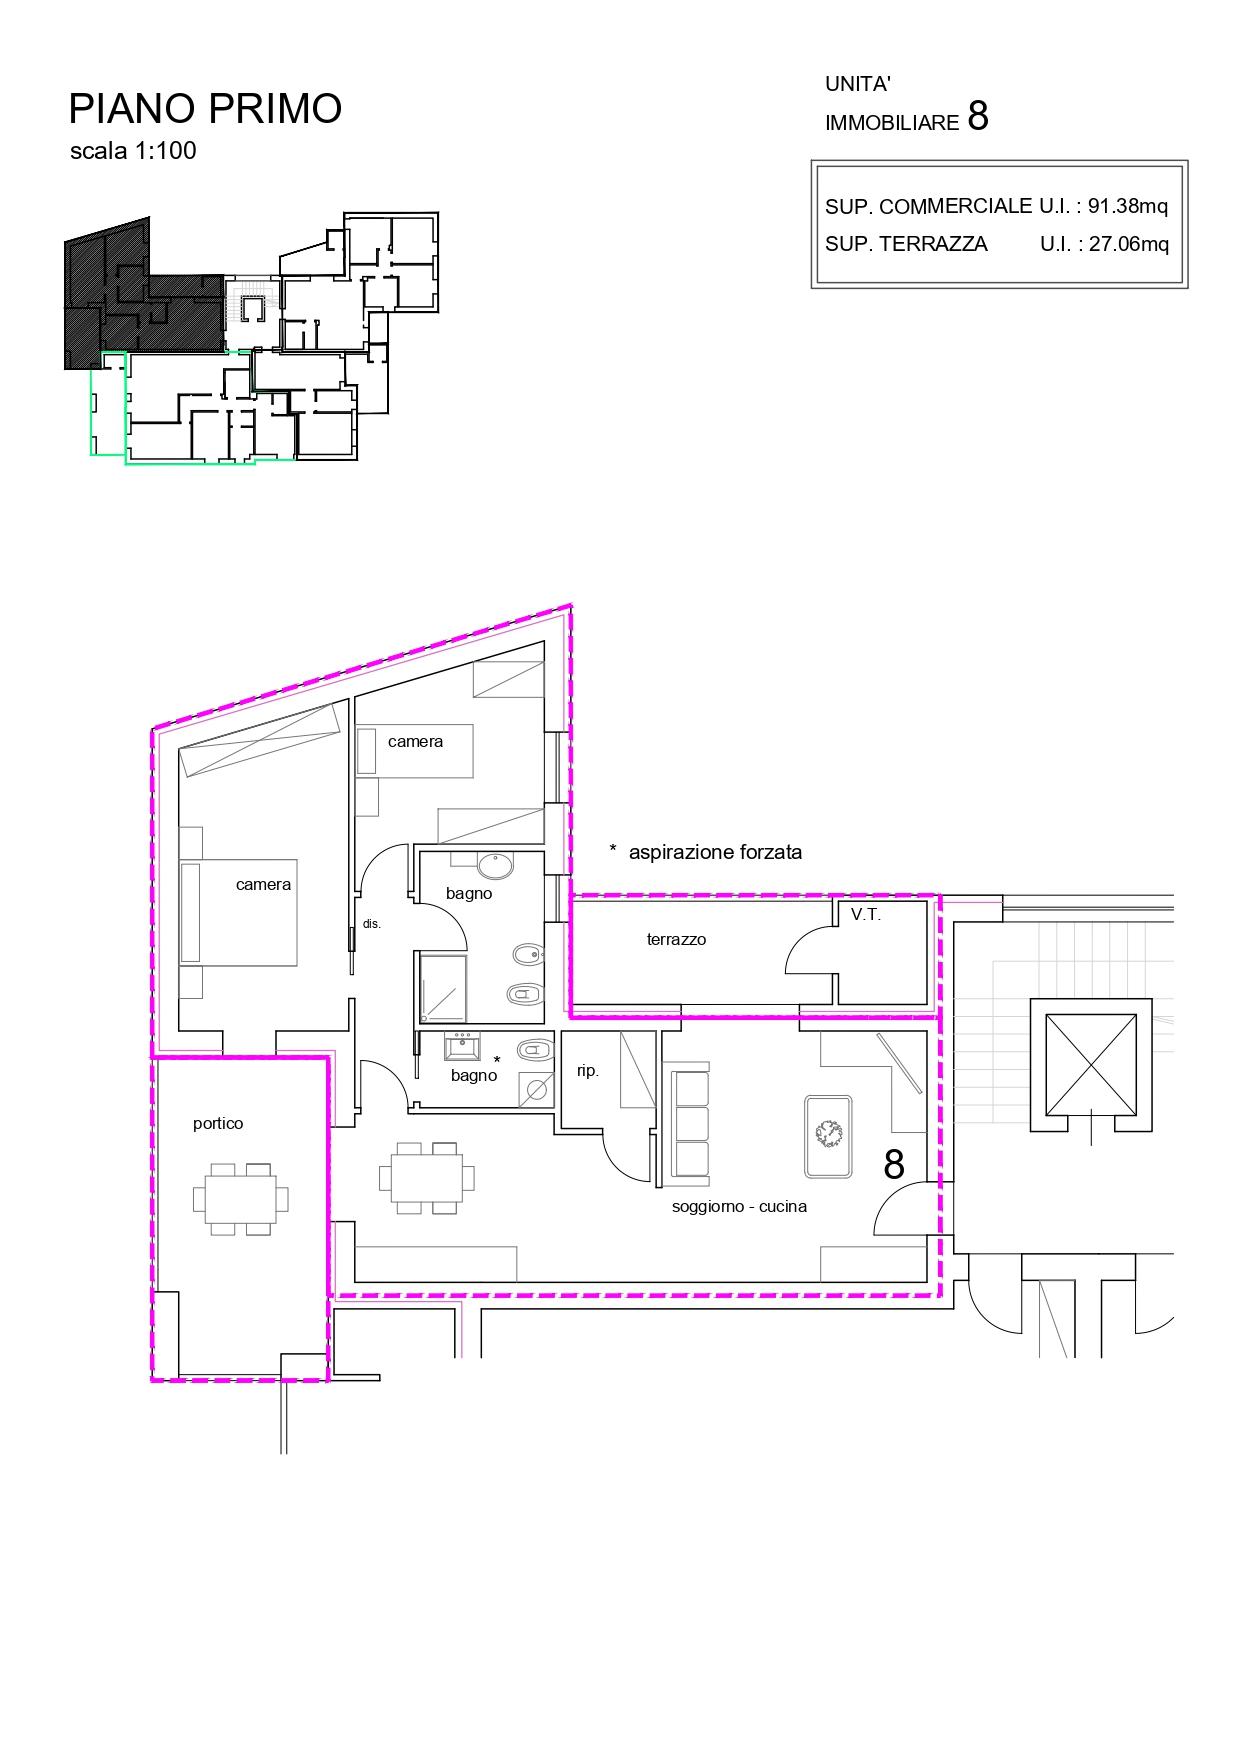 008_Appartamento 8_P1_page-0001